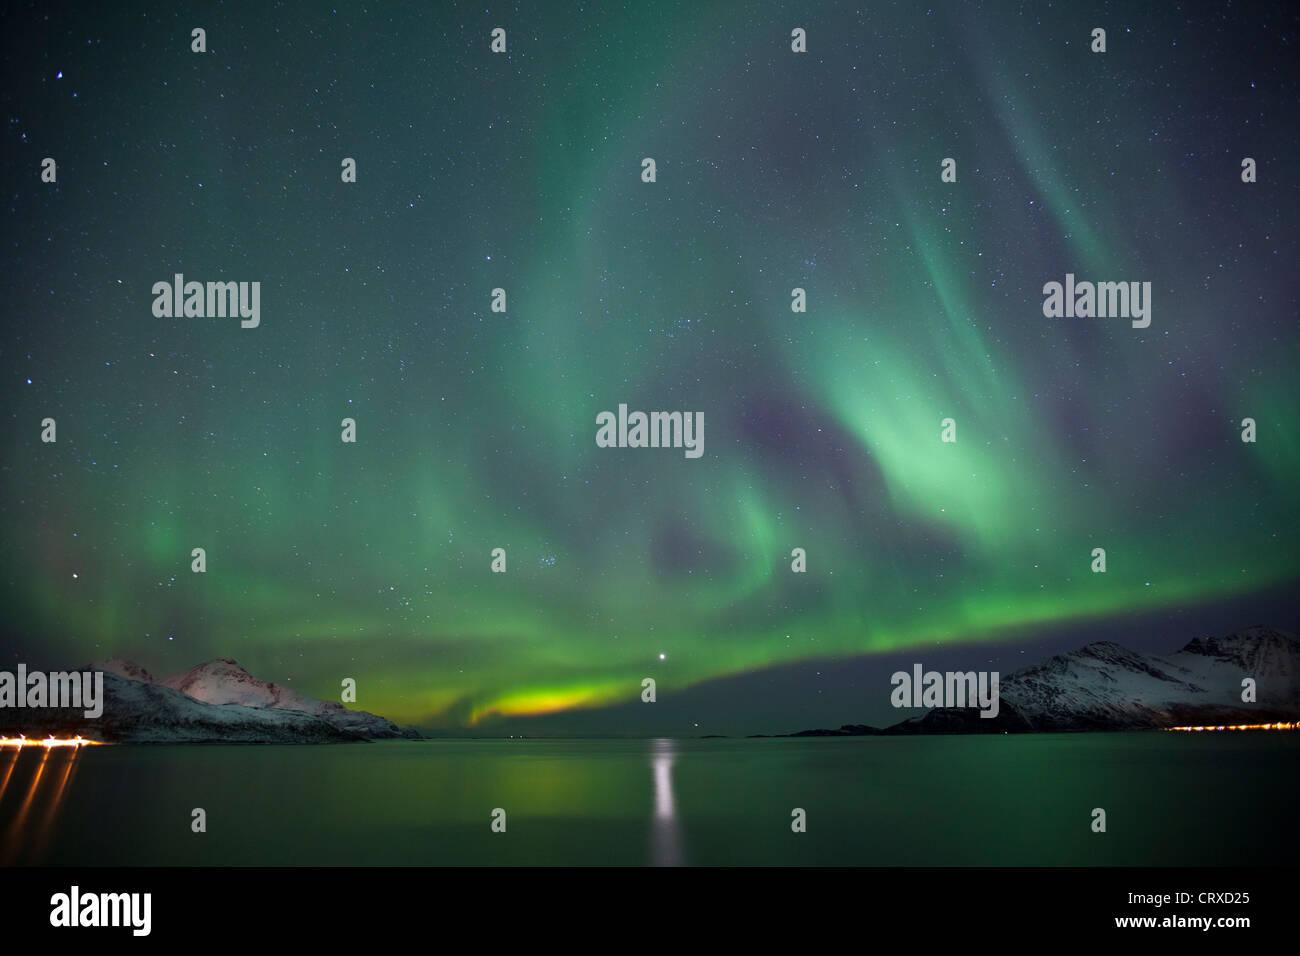 Aurora Borealis The Northern Lights fill the sky at Kvaloya in the Arctic Circle near Tromso, Northern Norway - Stock Image